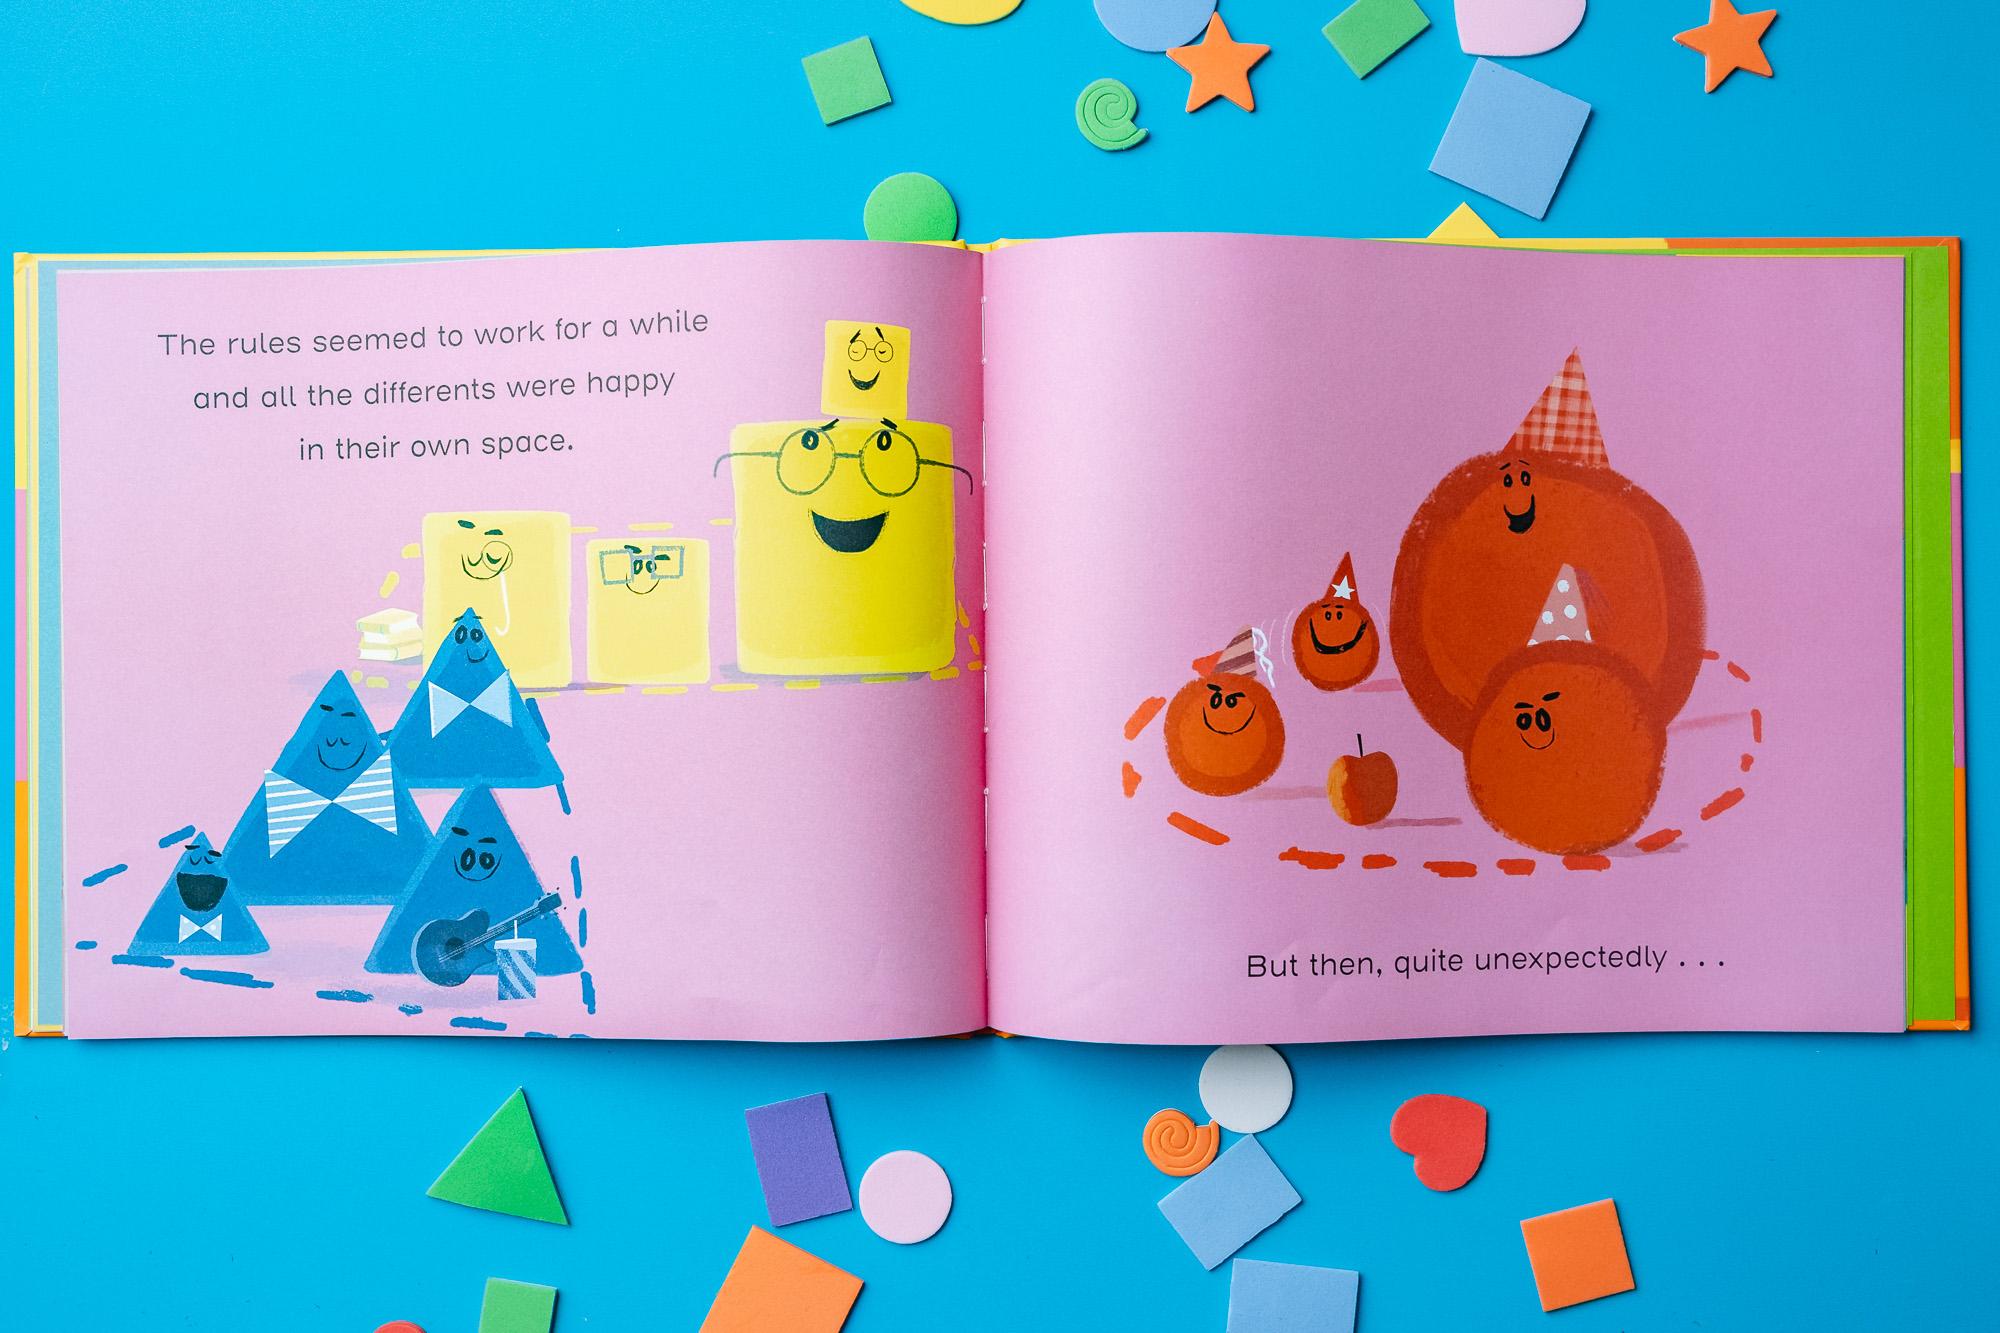 Rainbow_book_projecy-2.jpg